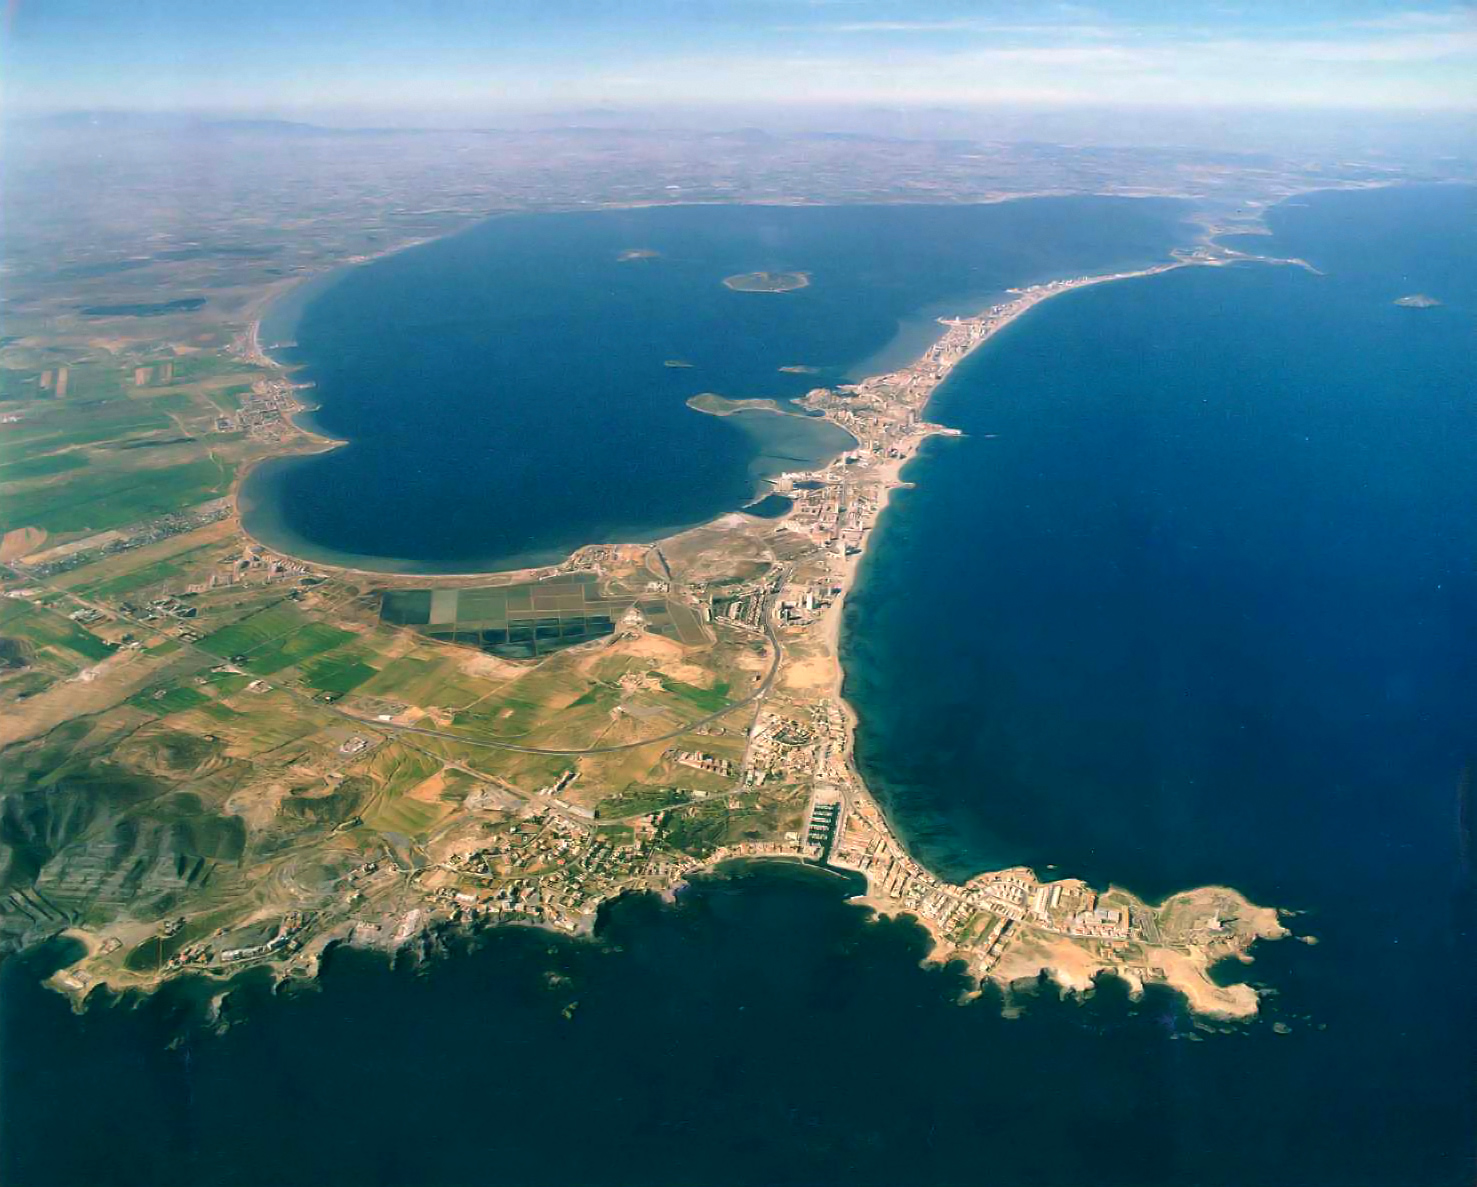 Properties Prices Costa Blanca Increases